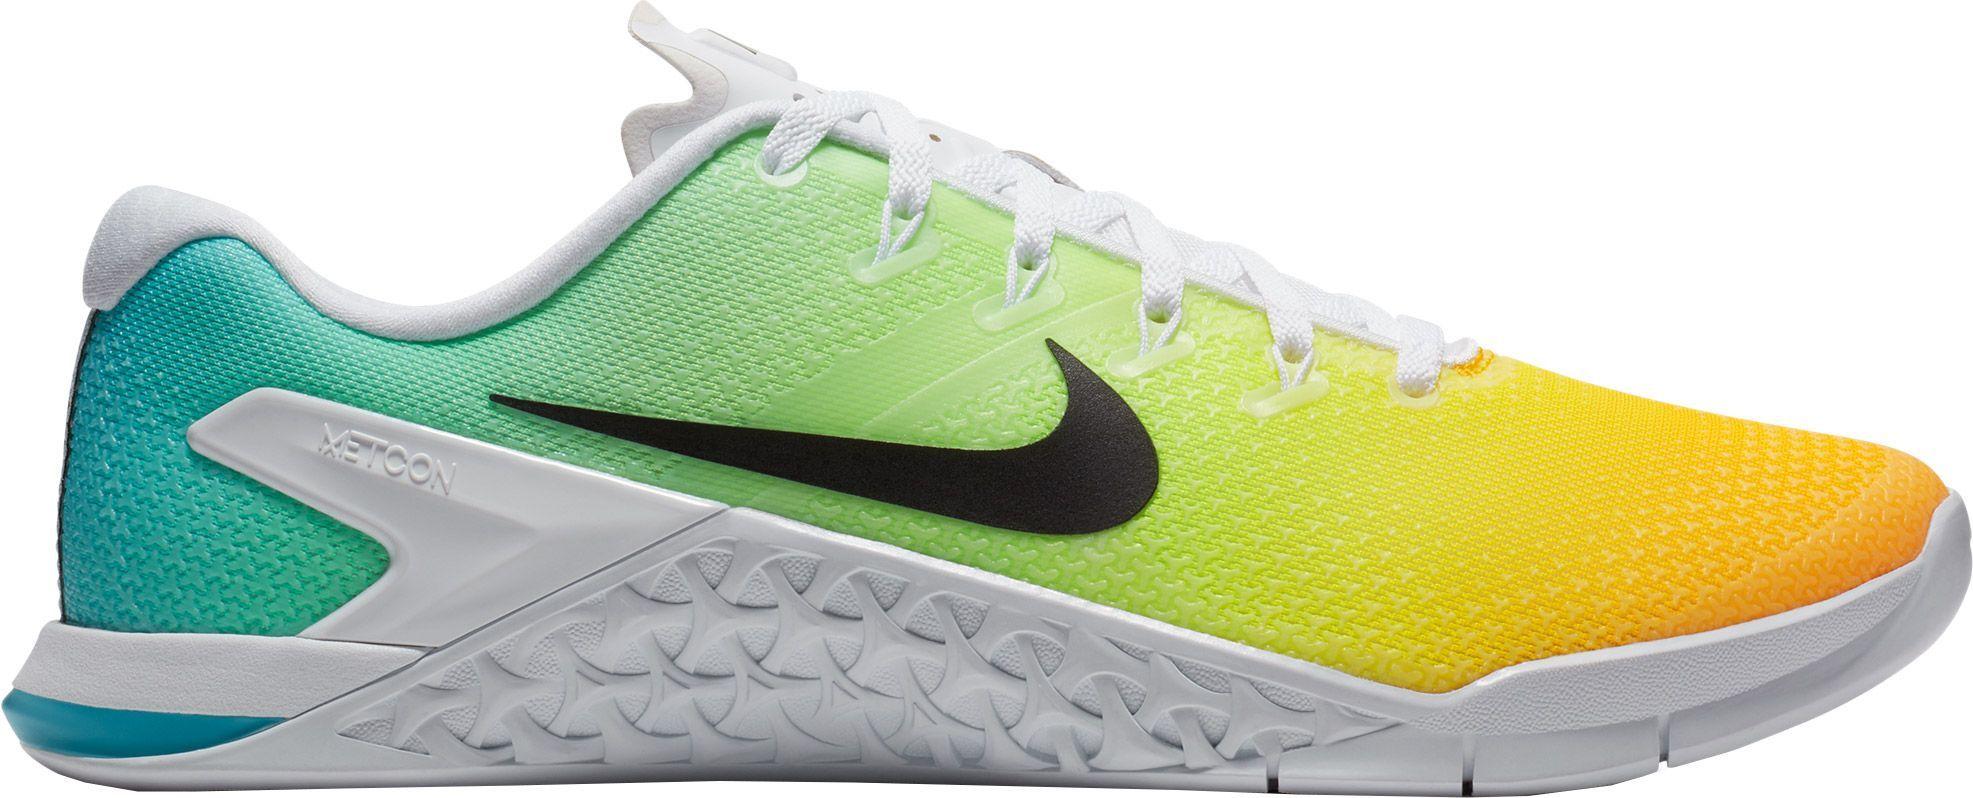 Nike Men's Metcon 4 Training Shoes Nike men, Training